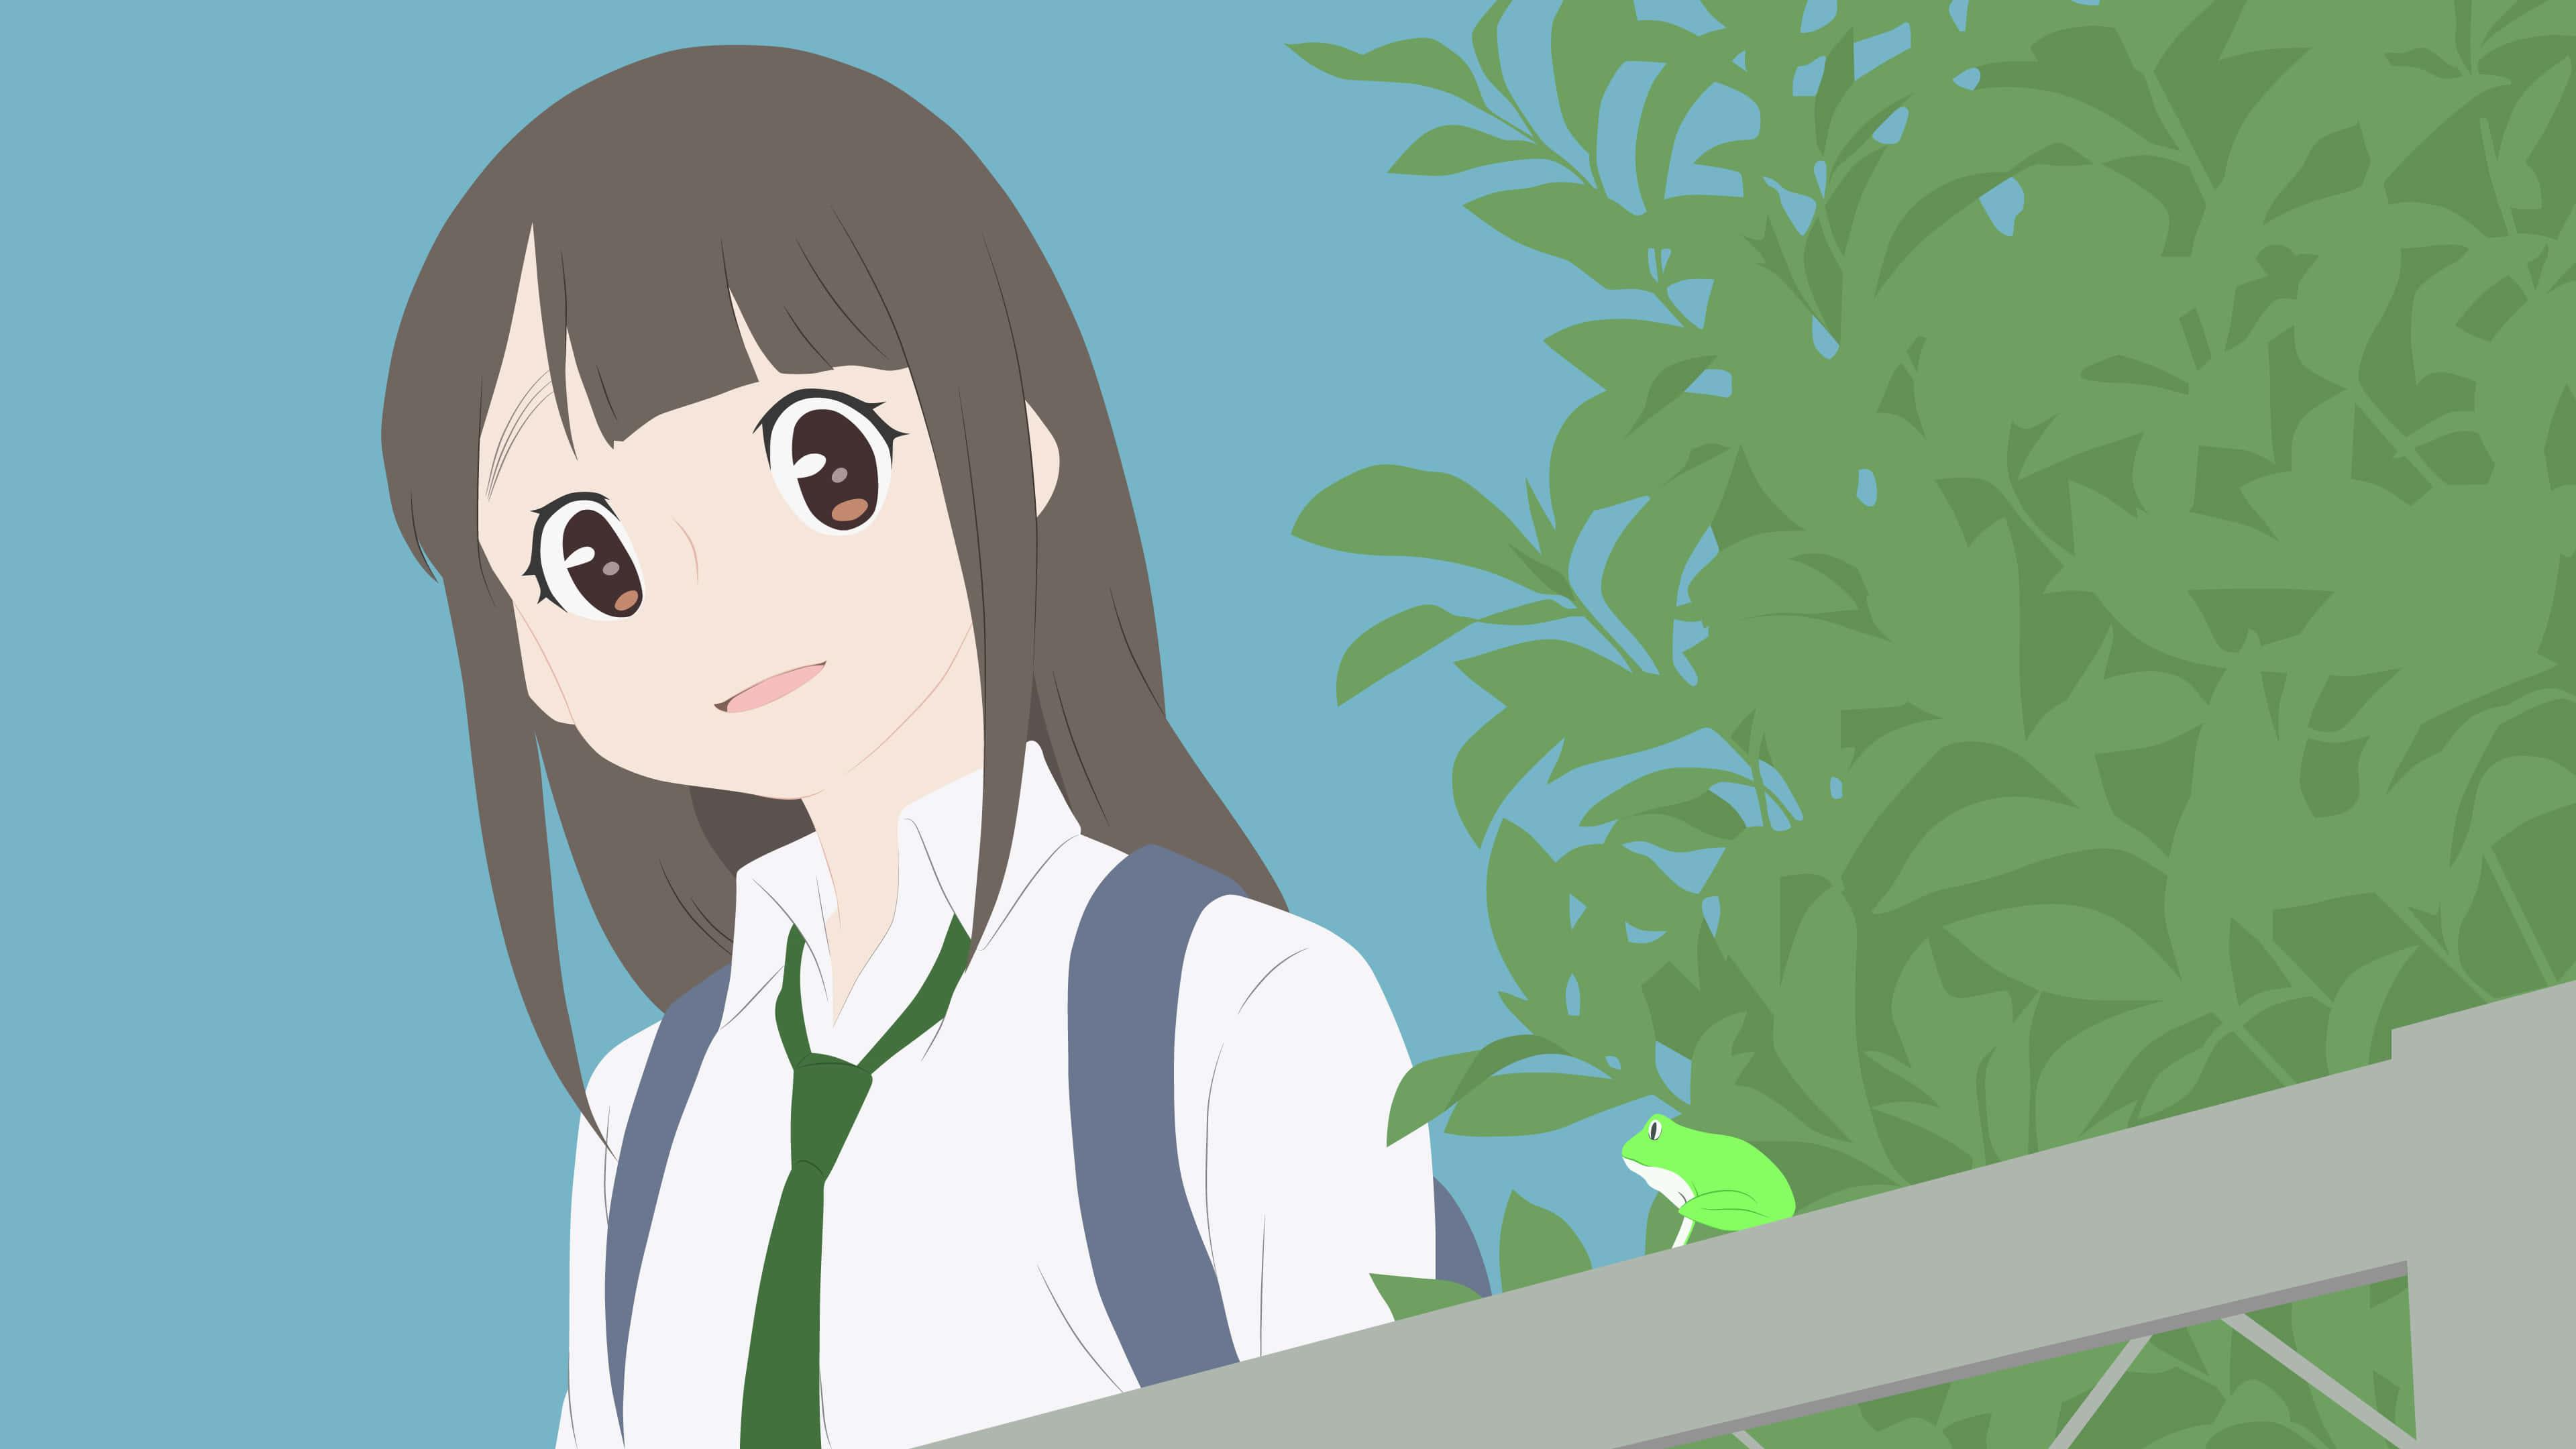 kimi no koe wo todoketai nagisa yukiai portrait uhd 4k wallpaper